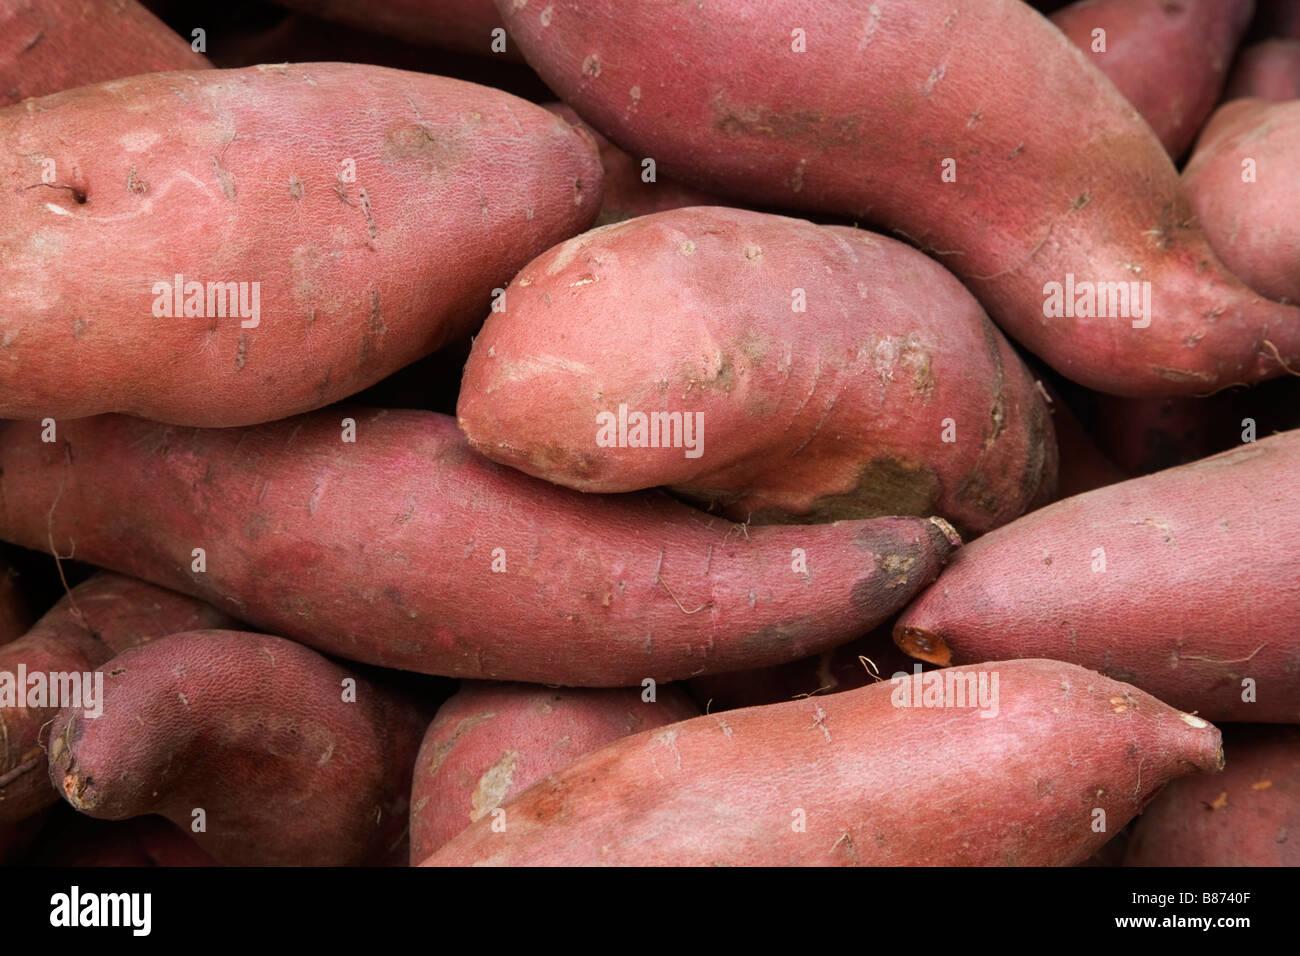 Harvested Yams 'Dioscorea'  species. - Stock Image